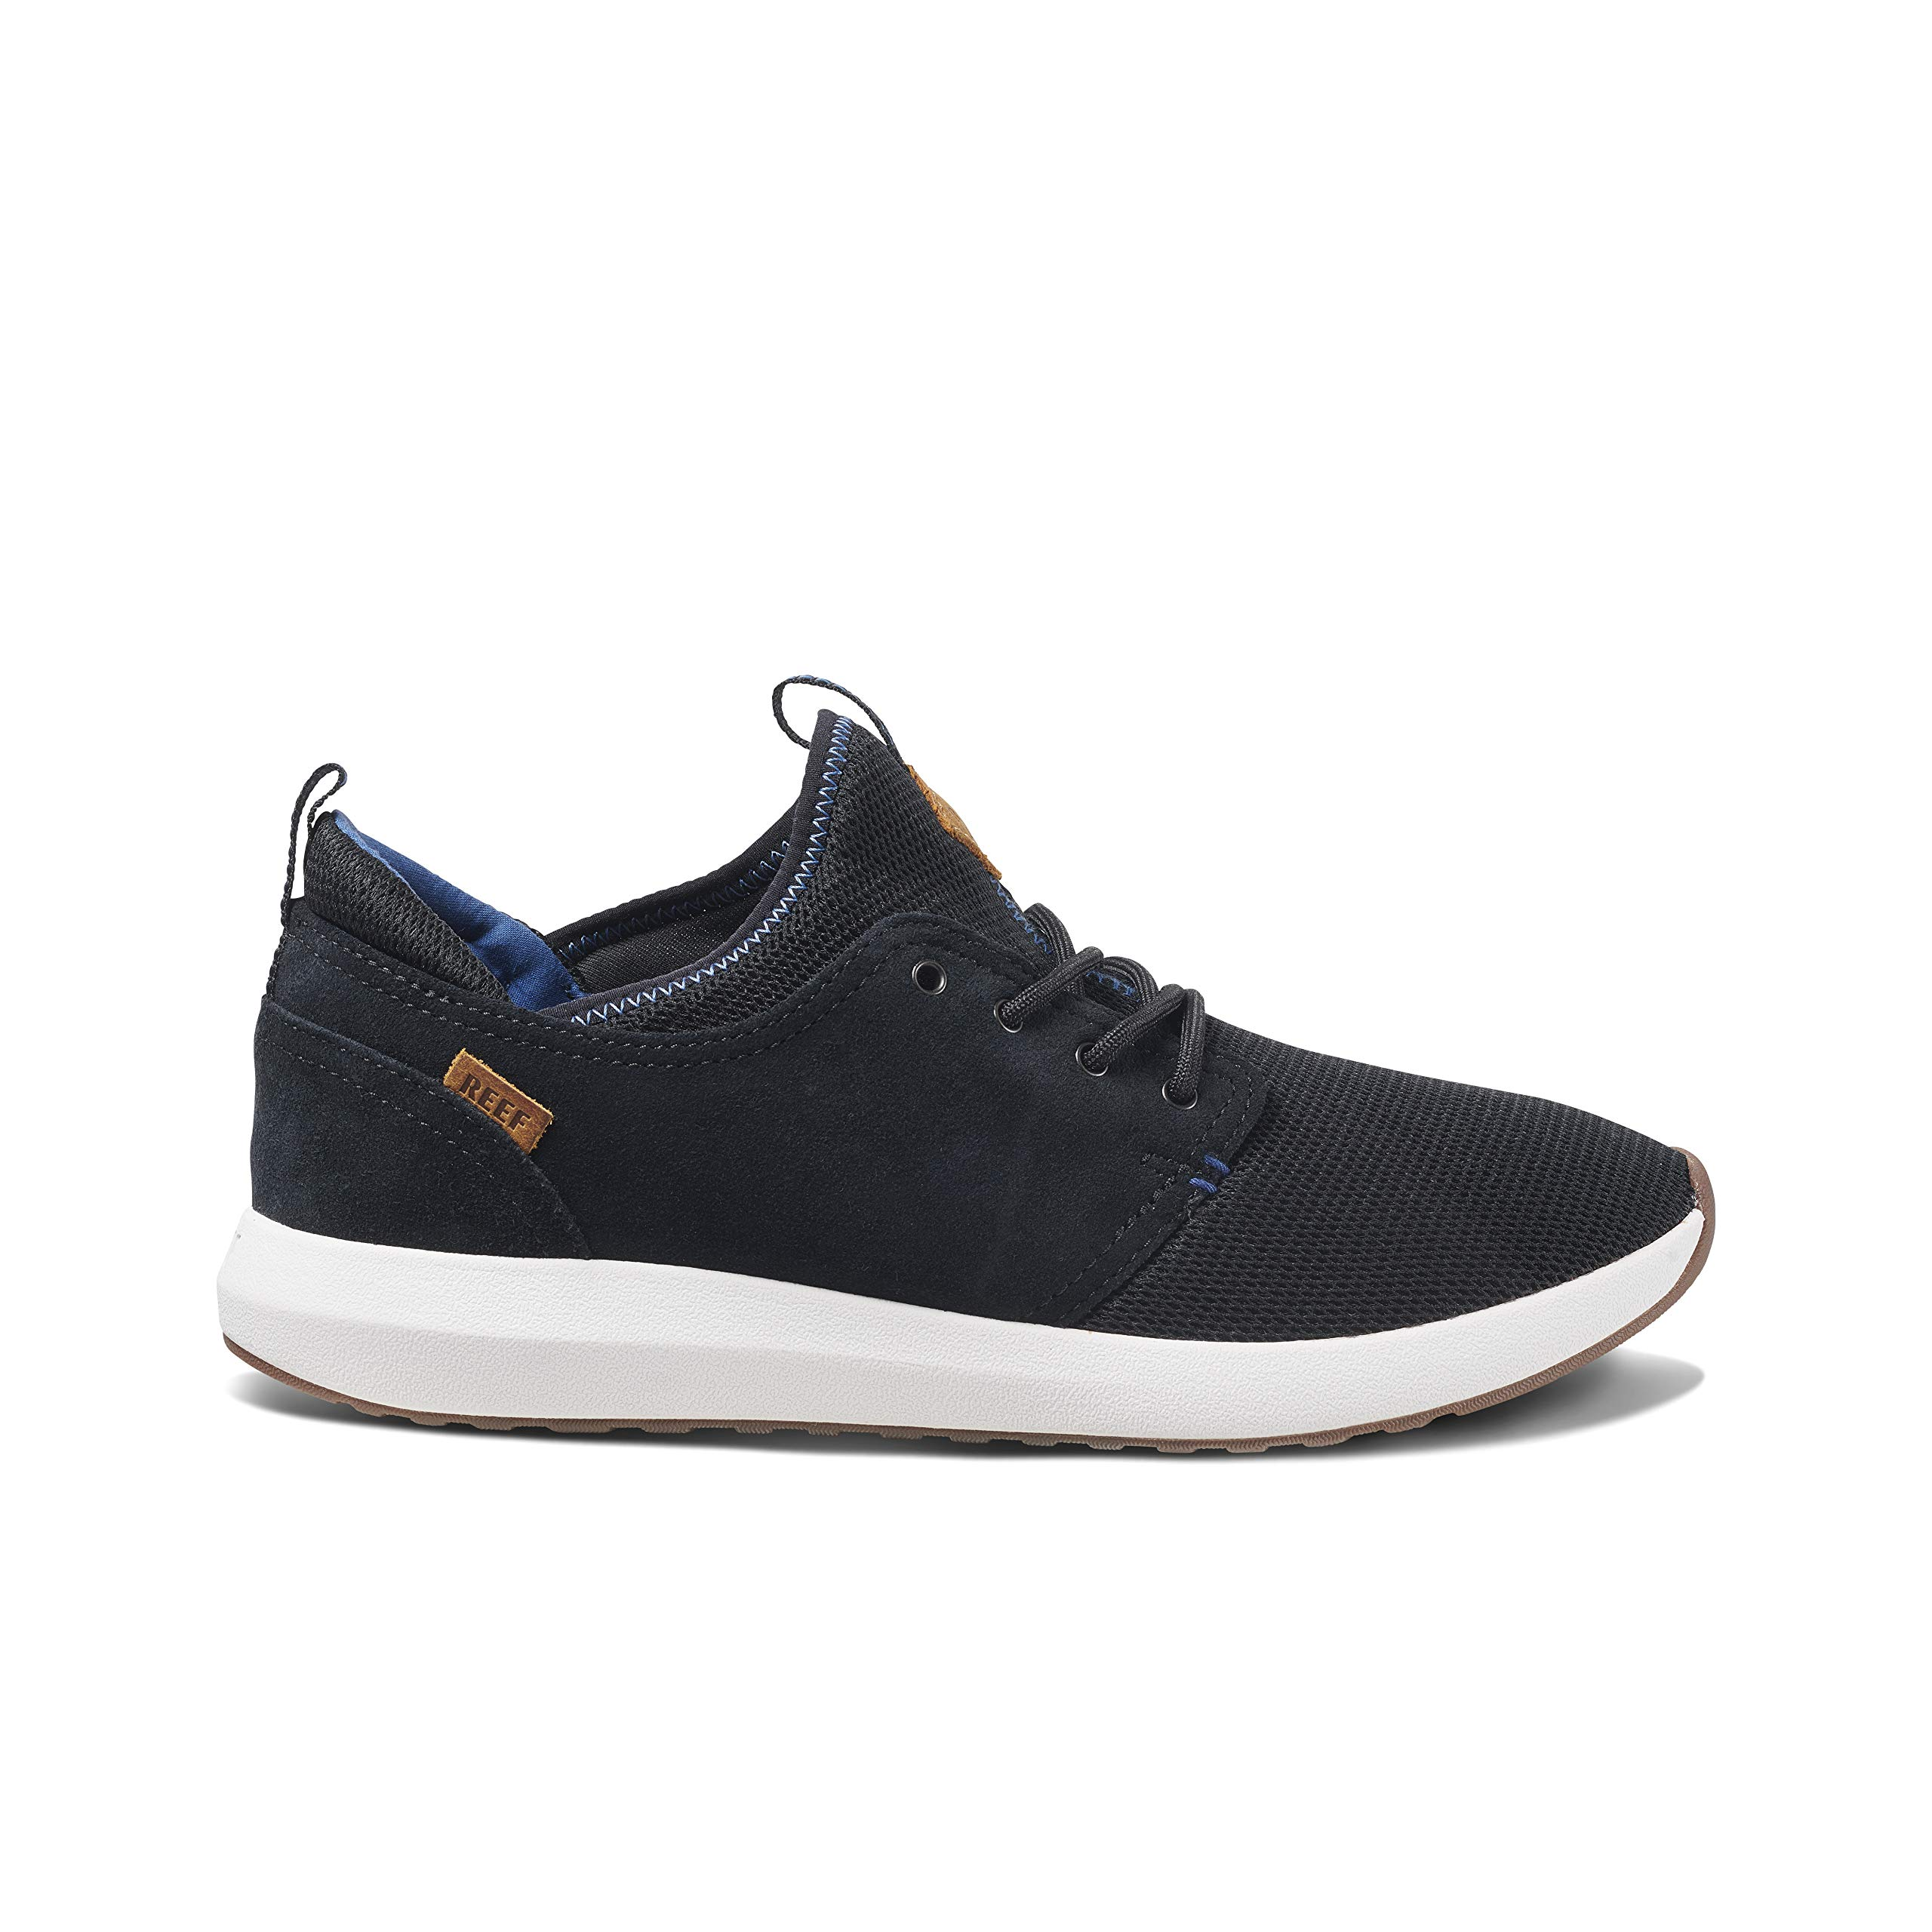 REEF Men's Cruiser Skate Shoe, Black/White/Aqua, 9